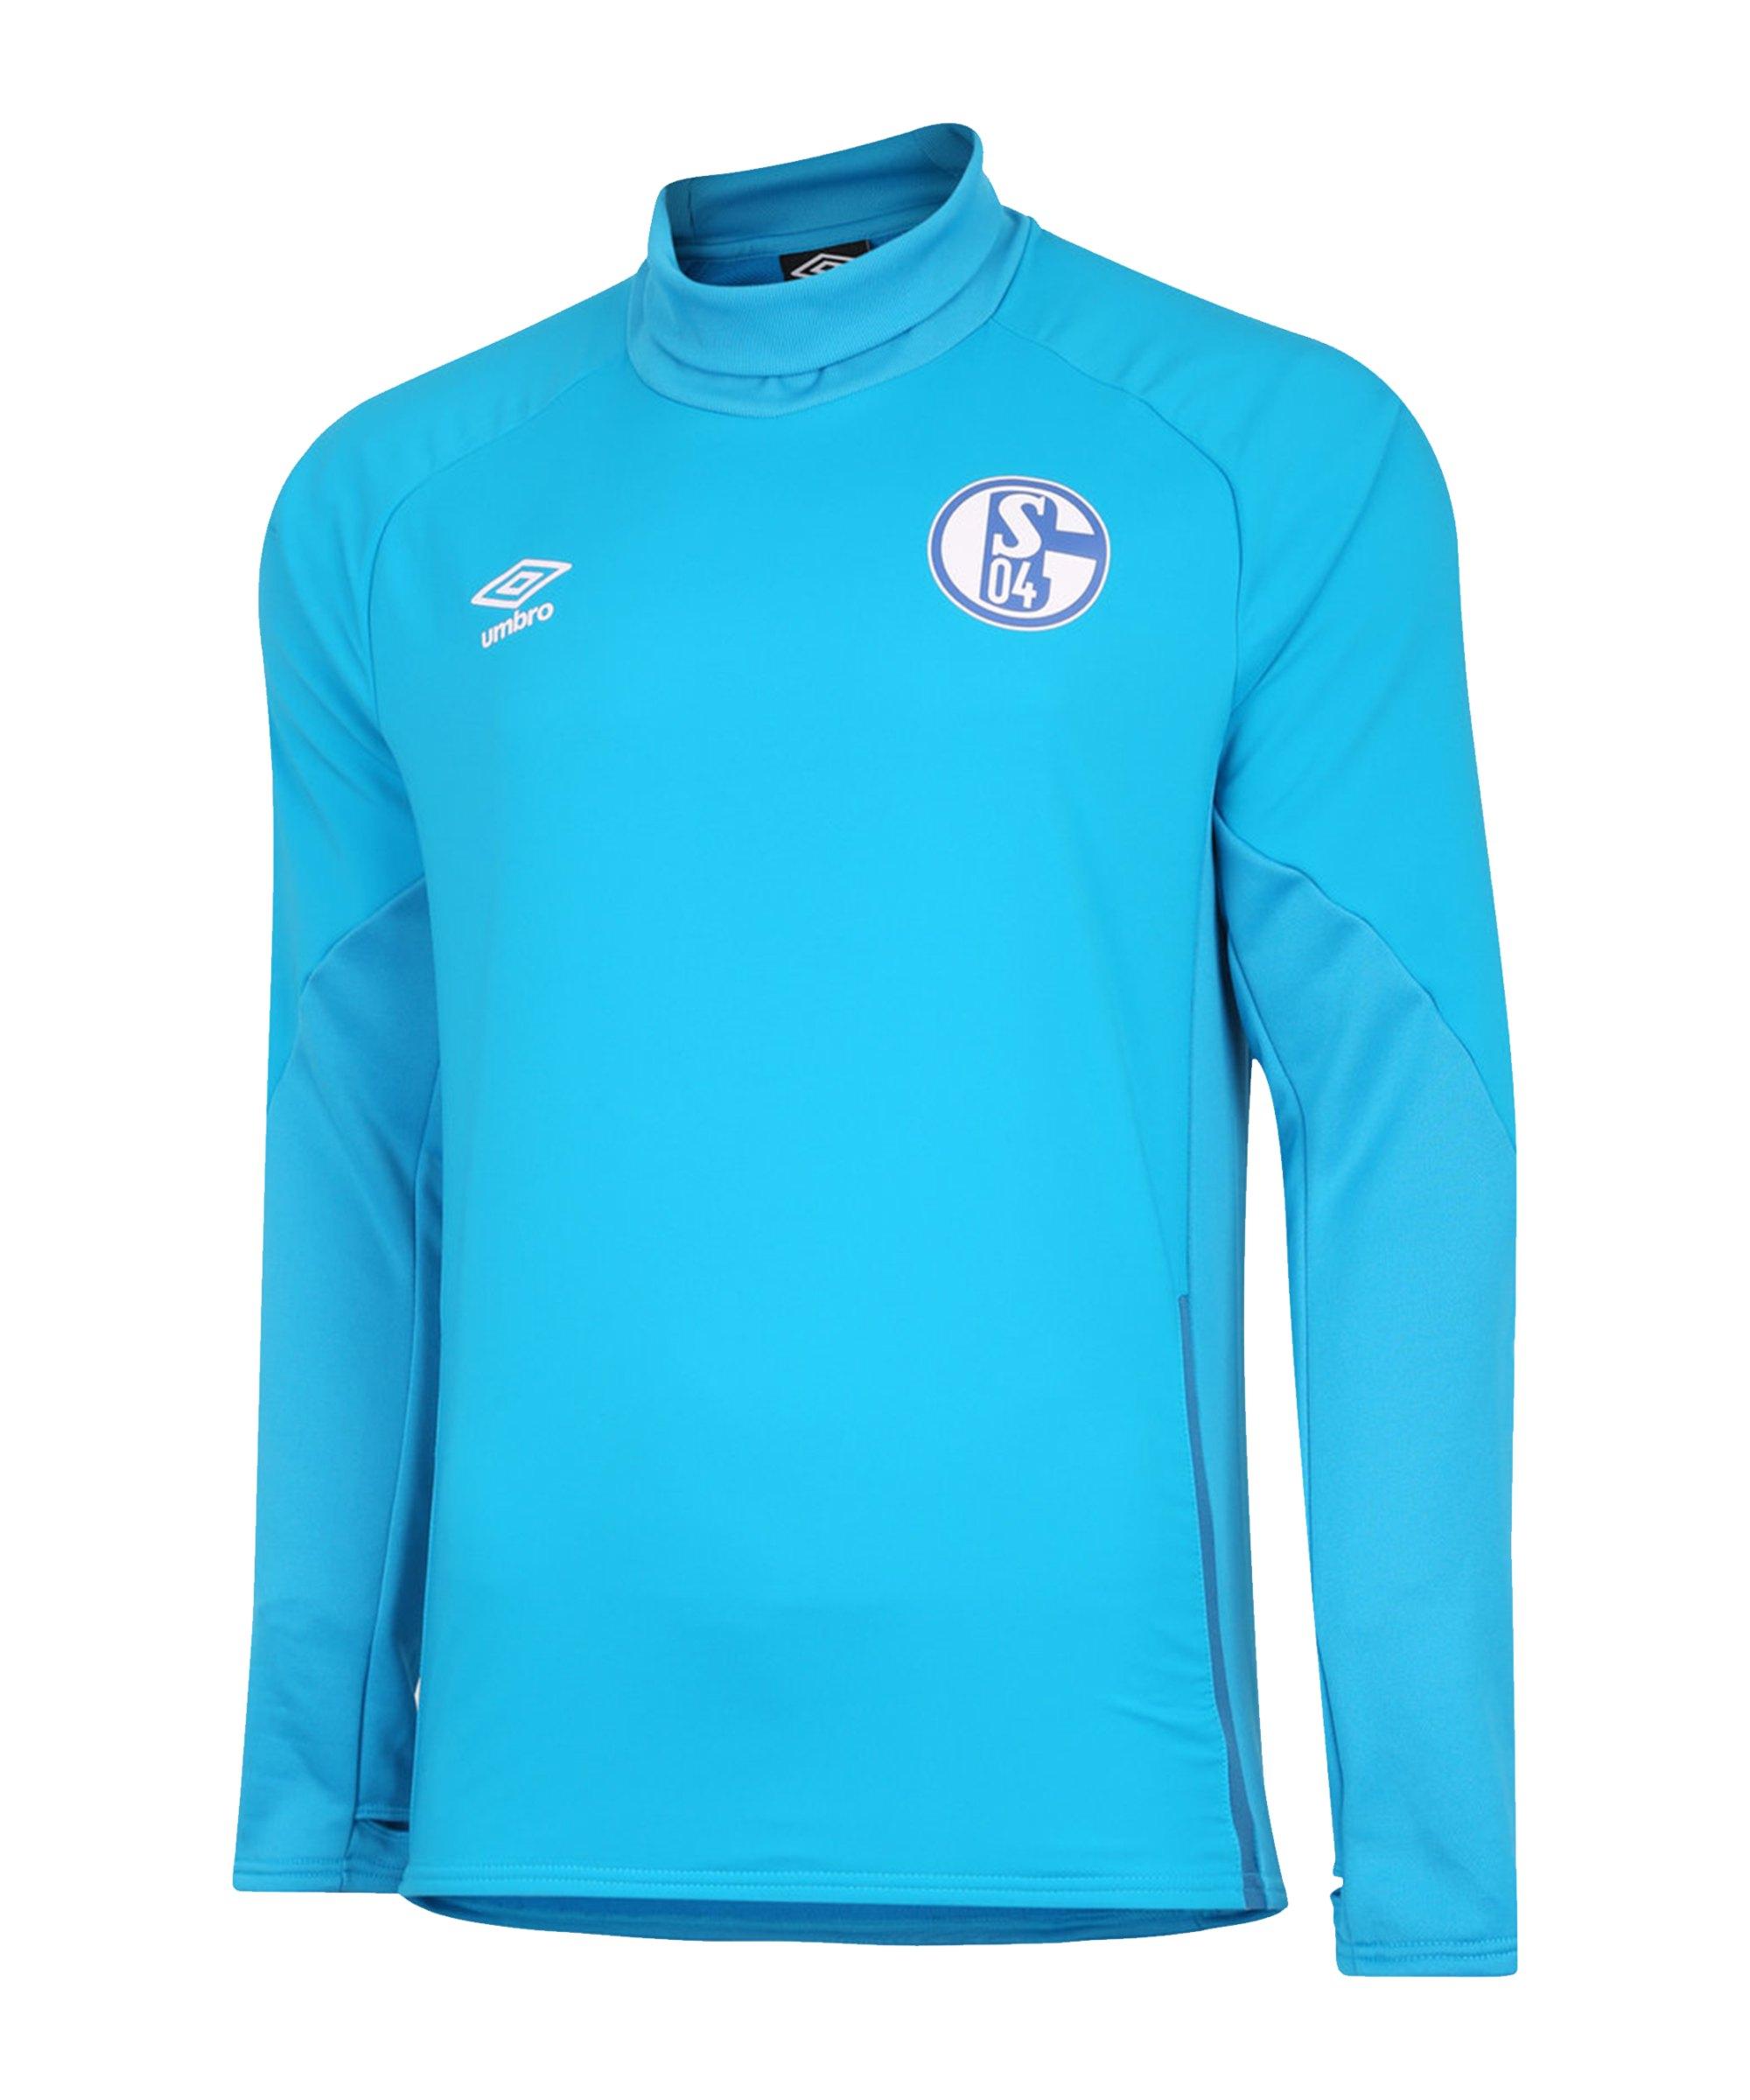 Umbro FC Schalke 04 Drill Top Blau FJRR - blau